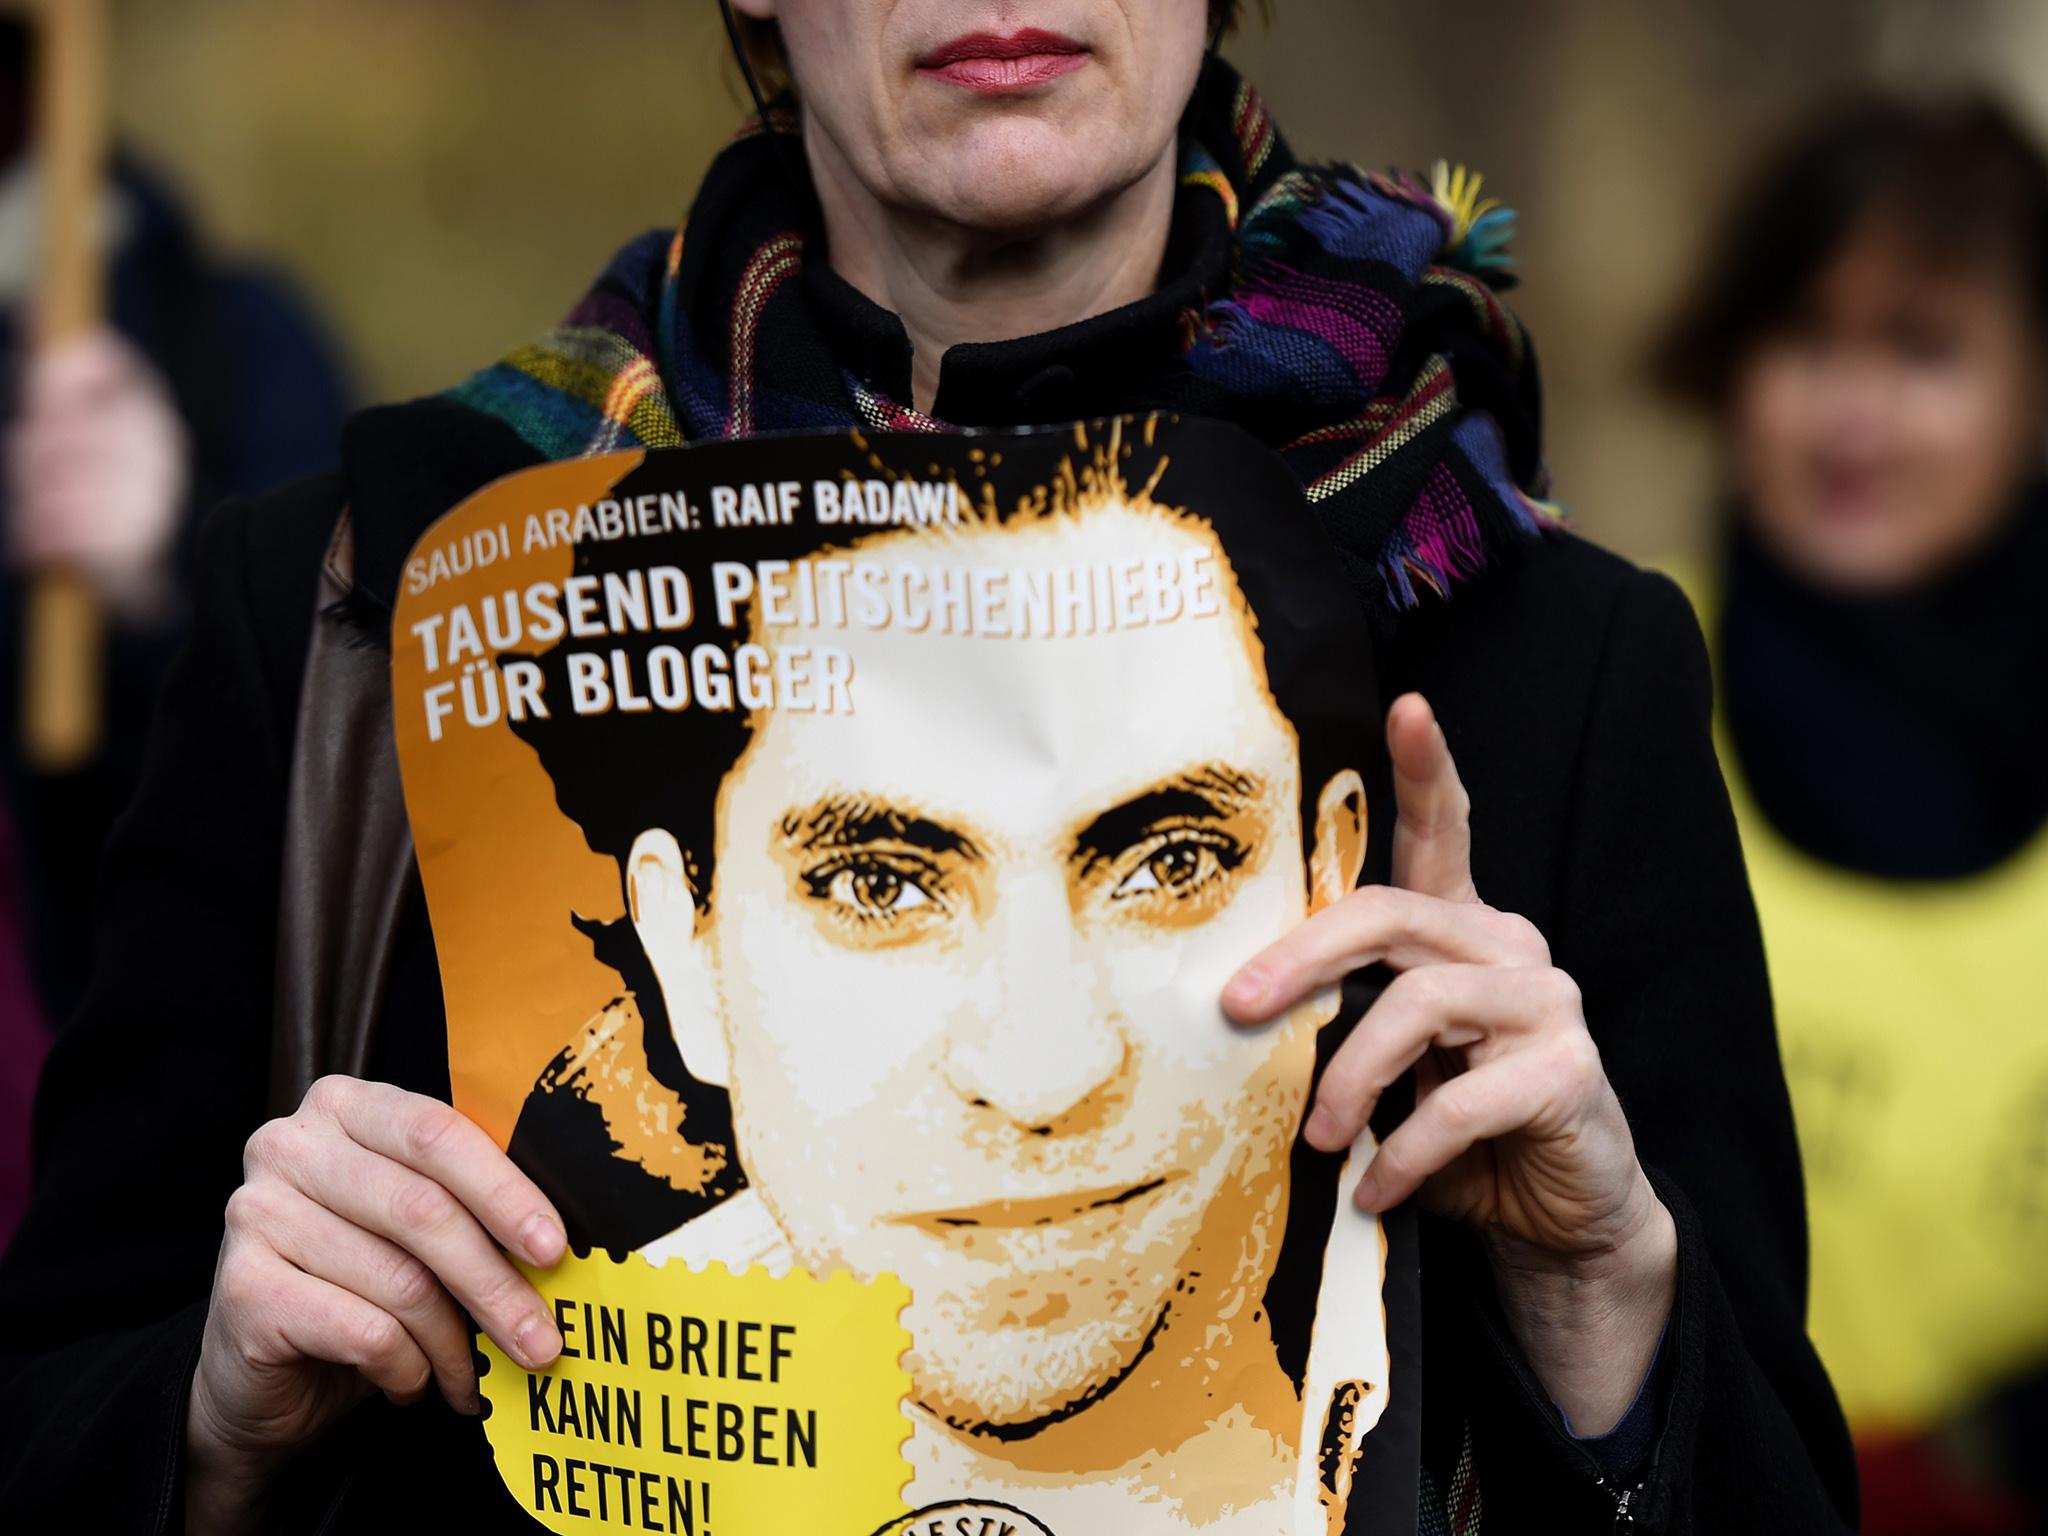 Raif-Badawi-Getty-Images